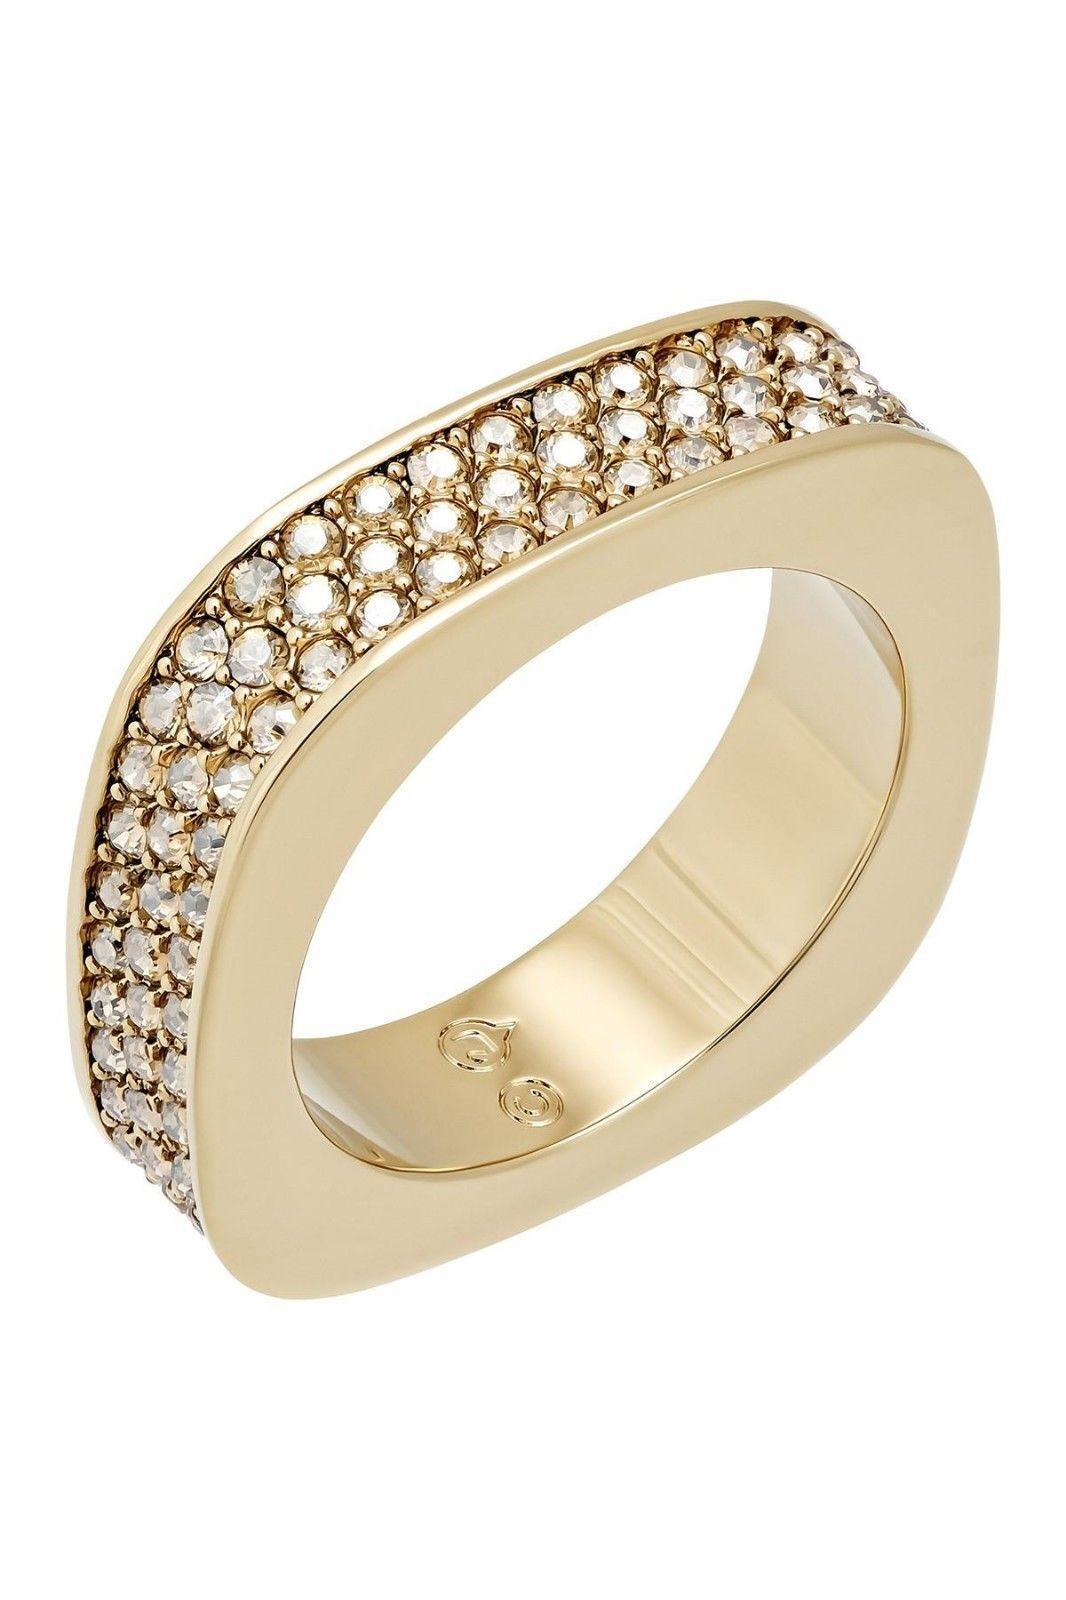 Swarovski Vio Ring gold Plated Swarovski Crystals Size 52 Small  UK size L